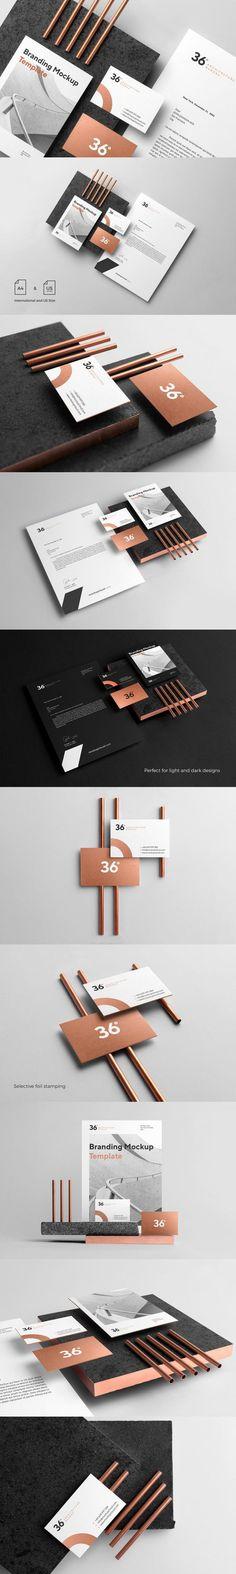 Copperstone Branding Mockup Vol. 1 #logo #editorial #invitation #background #mockupkit #psd #flyer #typography #android #tablecalendar #envelope #brand #paper #businesscards #foil #billboard #tag #idcard #iridescentbook